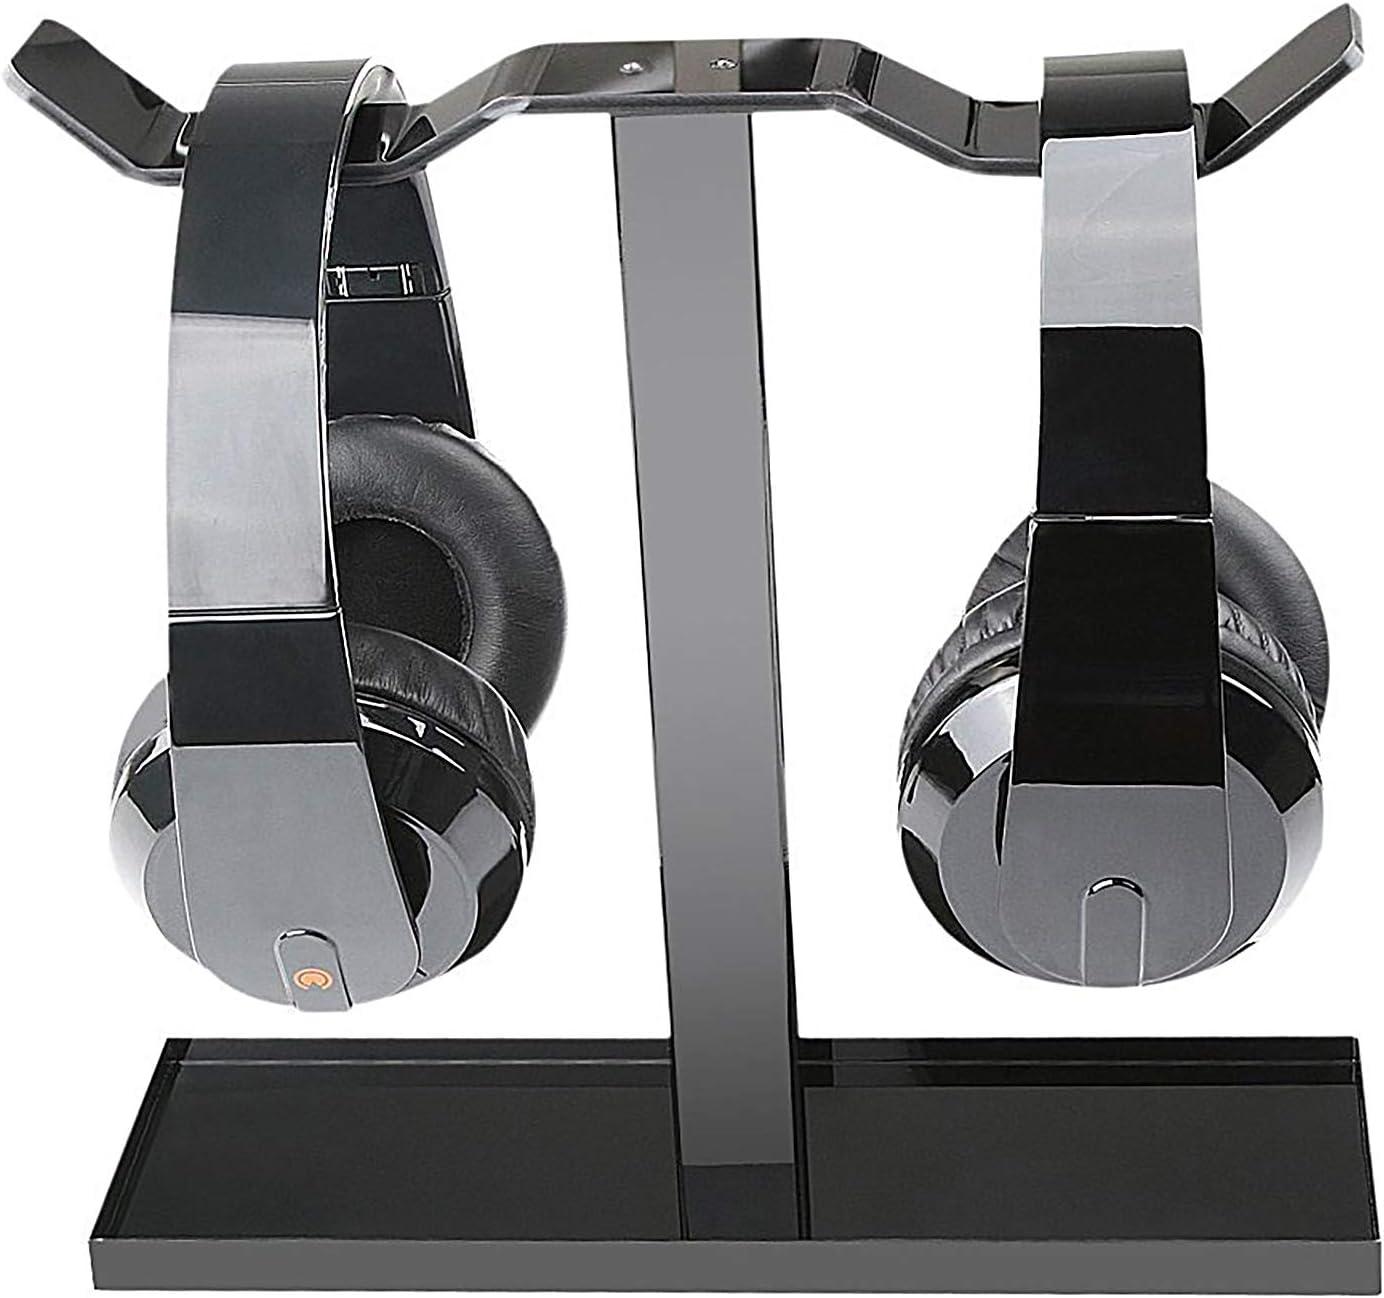 360 Degree Swivel Springed Clamp Headphone Desk Hanger Hook for RS120 Desire2 Headphone Headset Stand Holder QuietComfort Black MDRZX110 Headphones and More Riff SoundLink Momentum